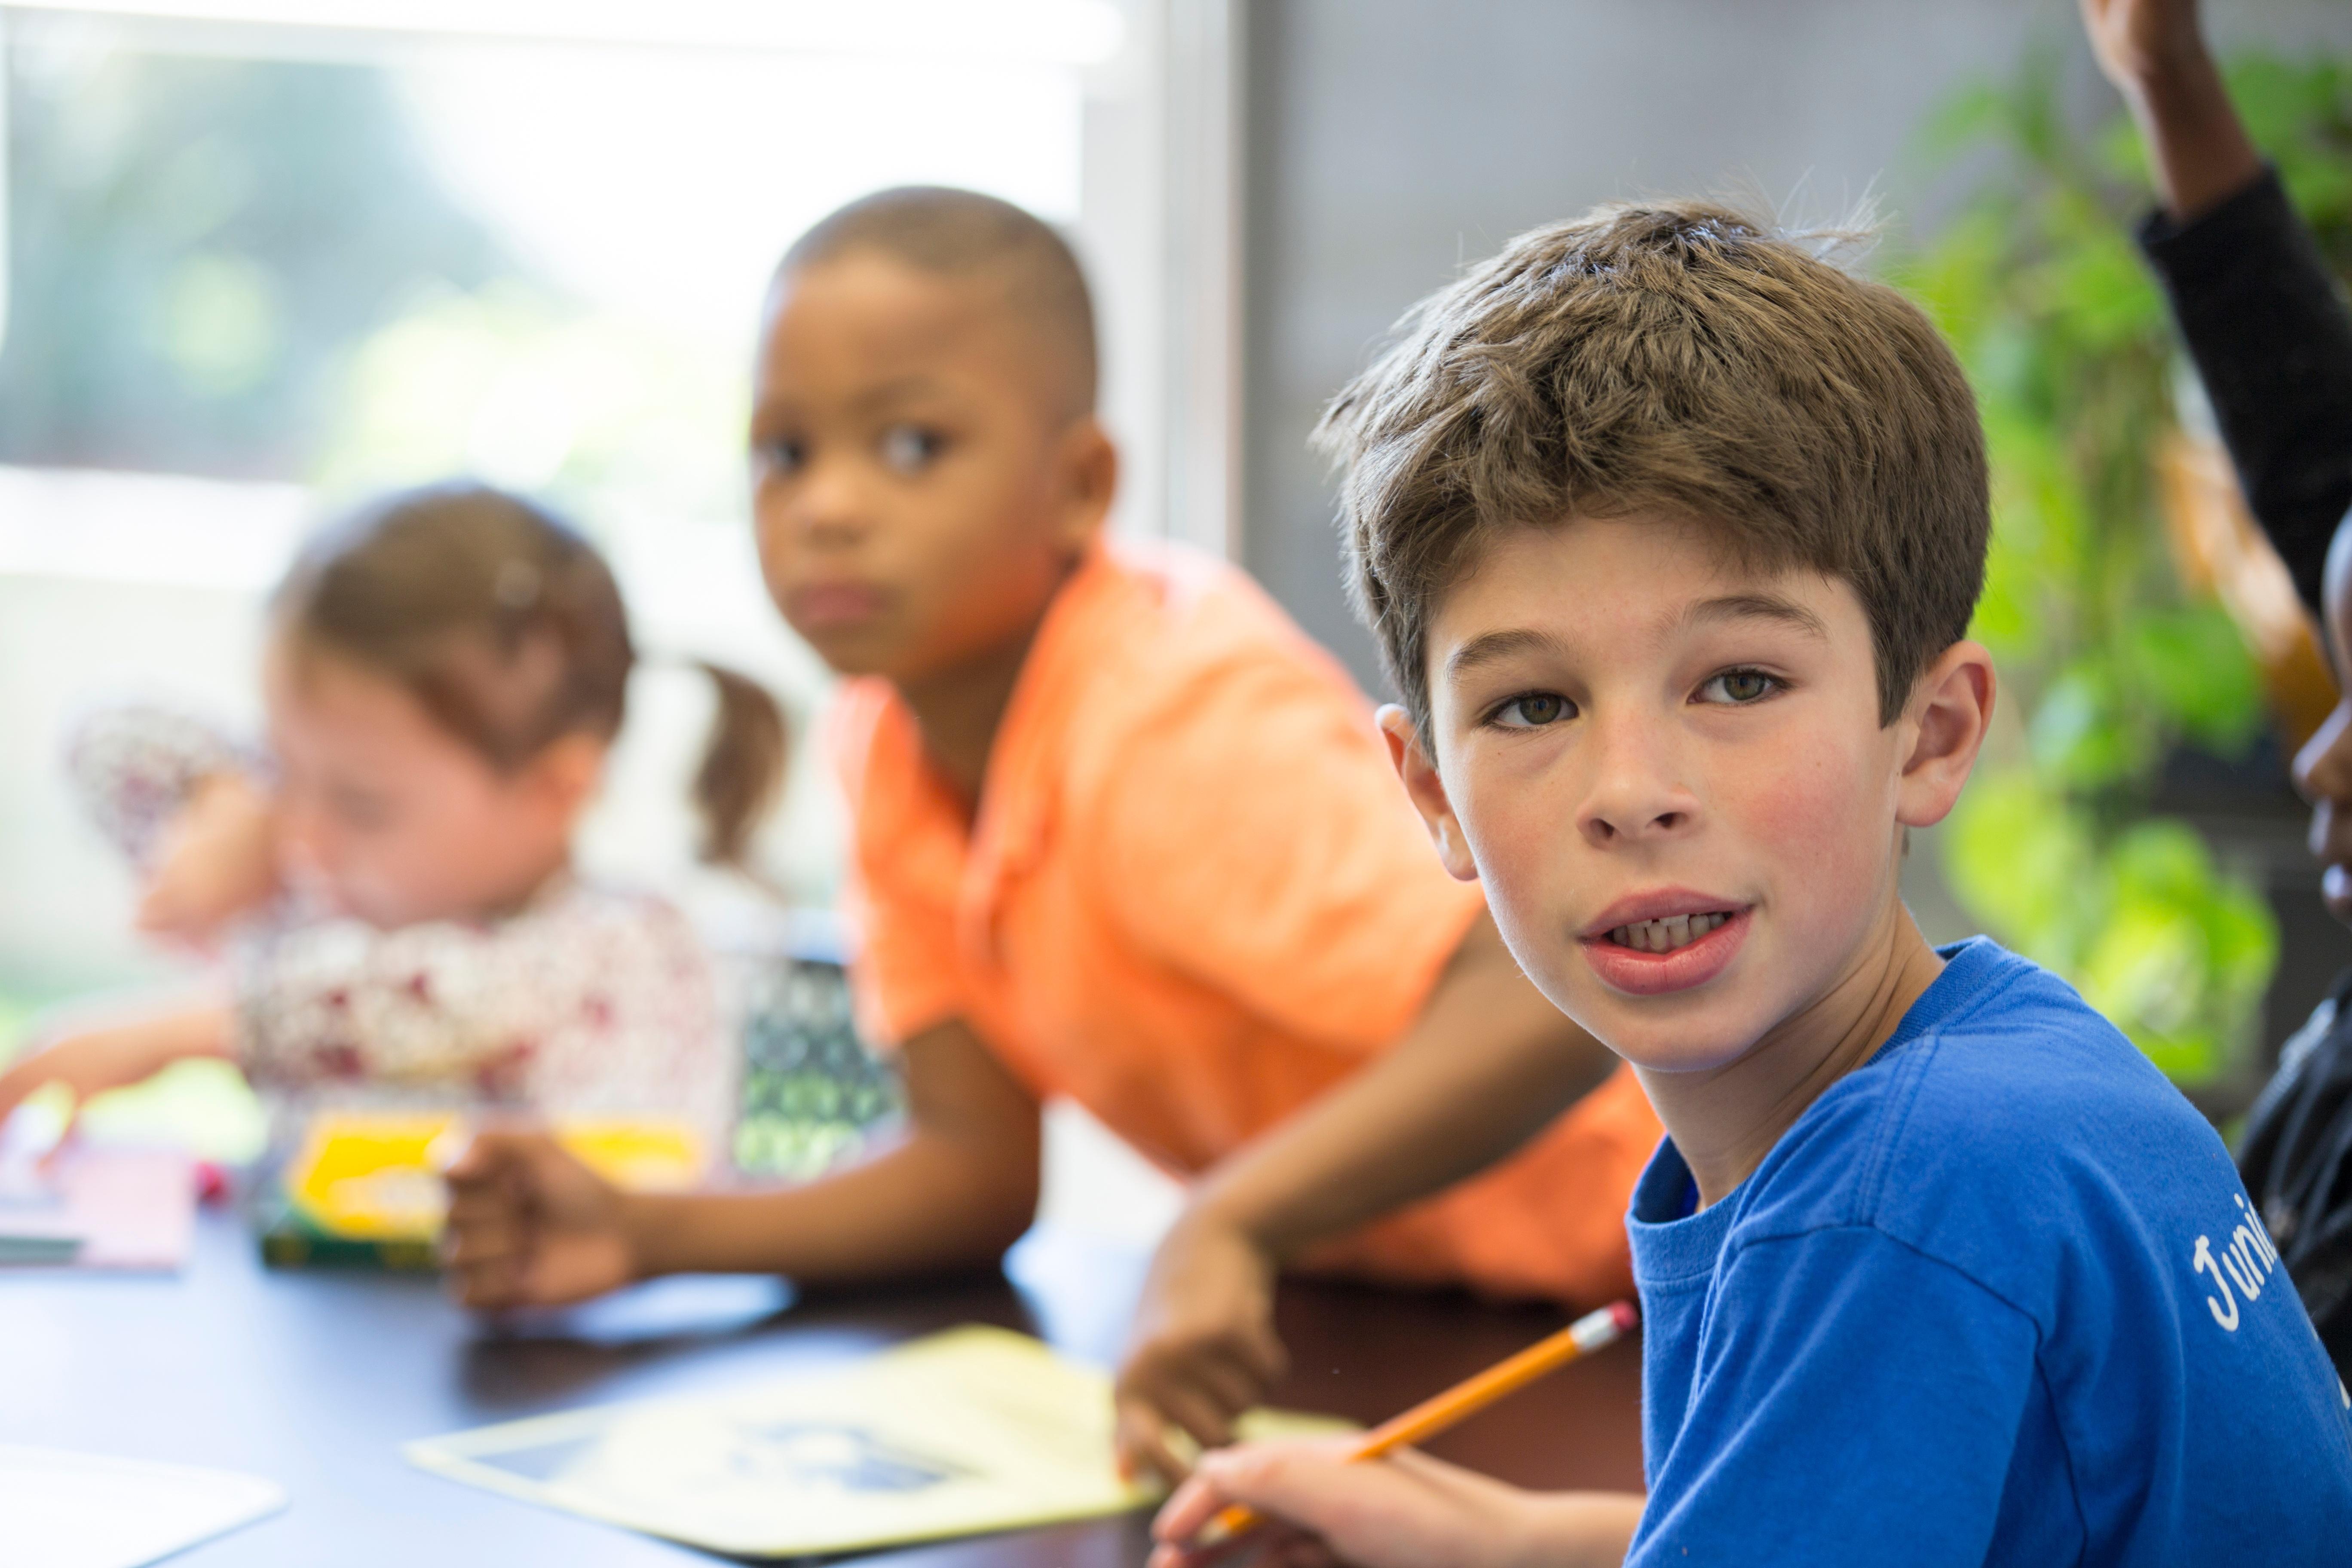 halifax learning reading program reading support read write spell education literacy evidence-driven tutor tutoring